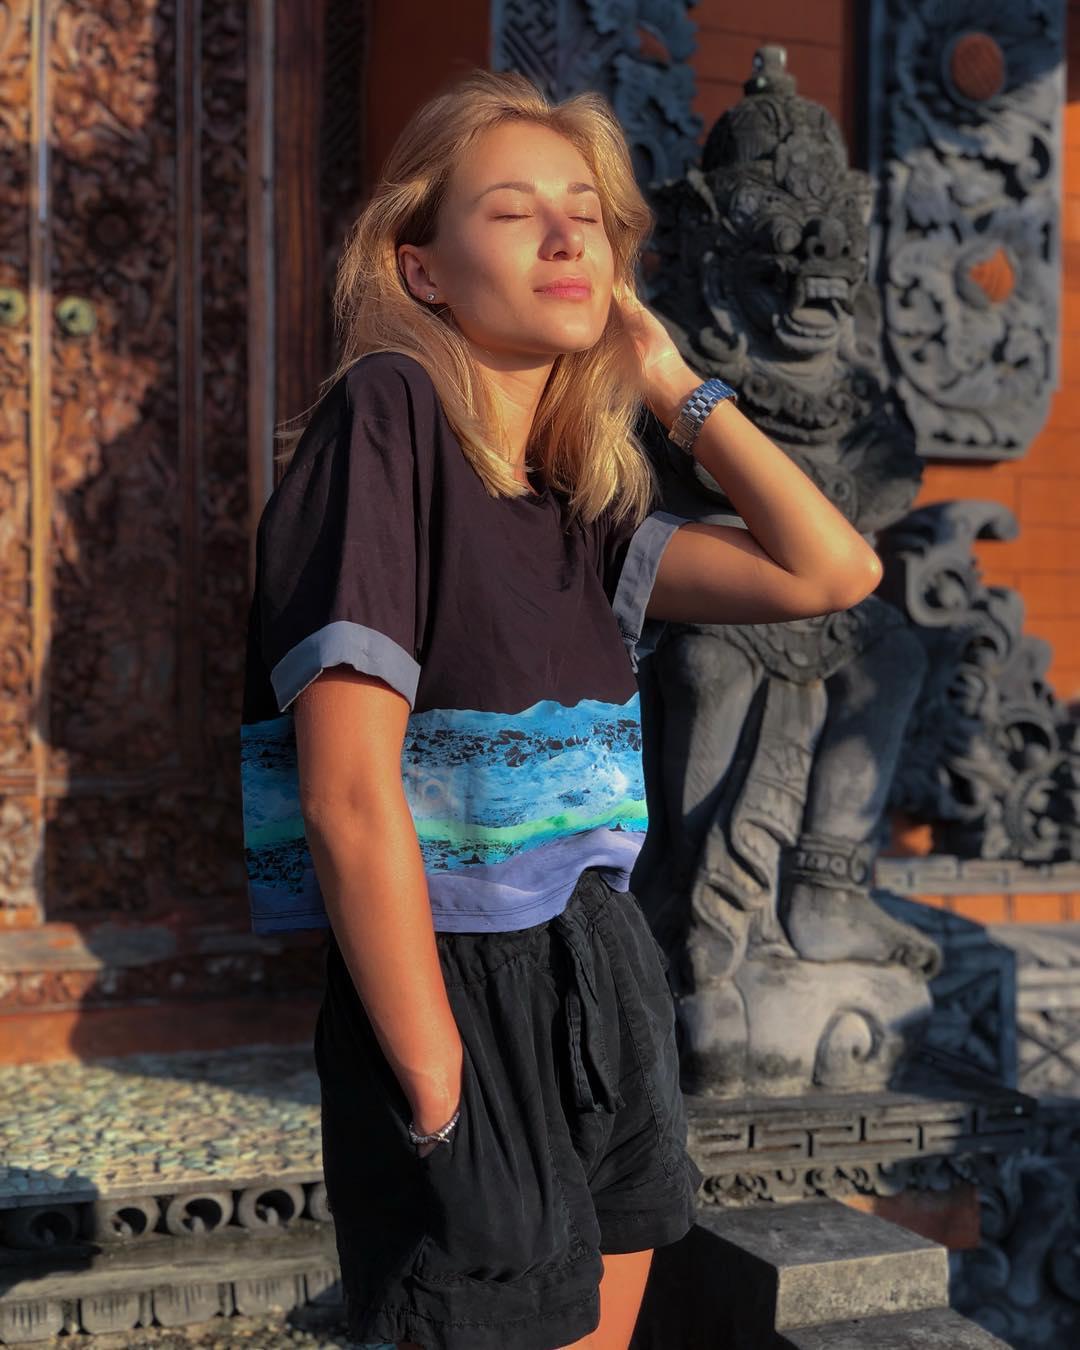 Daria-lytvyn-Wallpapers-Insta-Fit-Bio-4